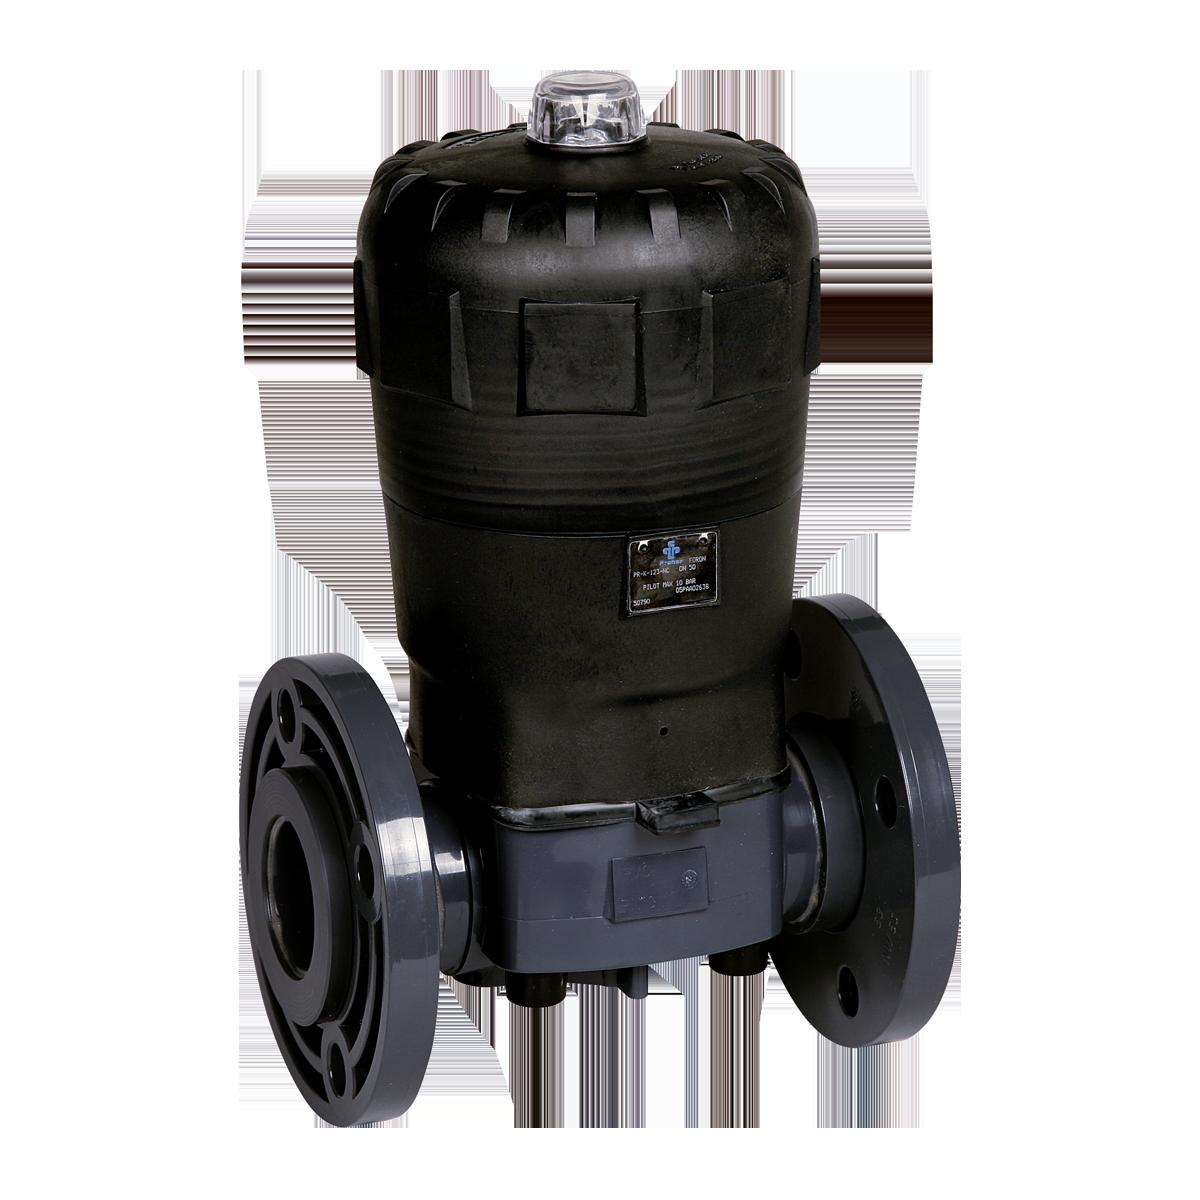 Praher Diaphragm Valve T4 PVC with pneumatic actuator, grey, black